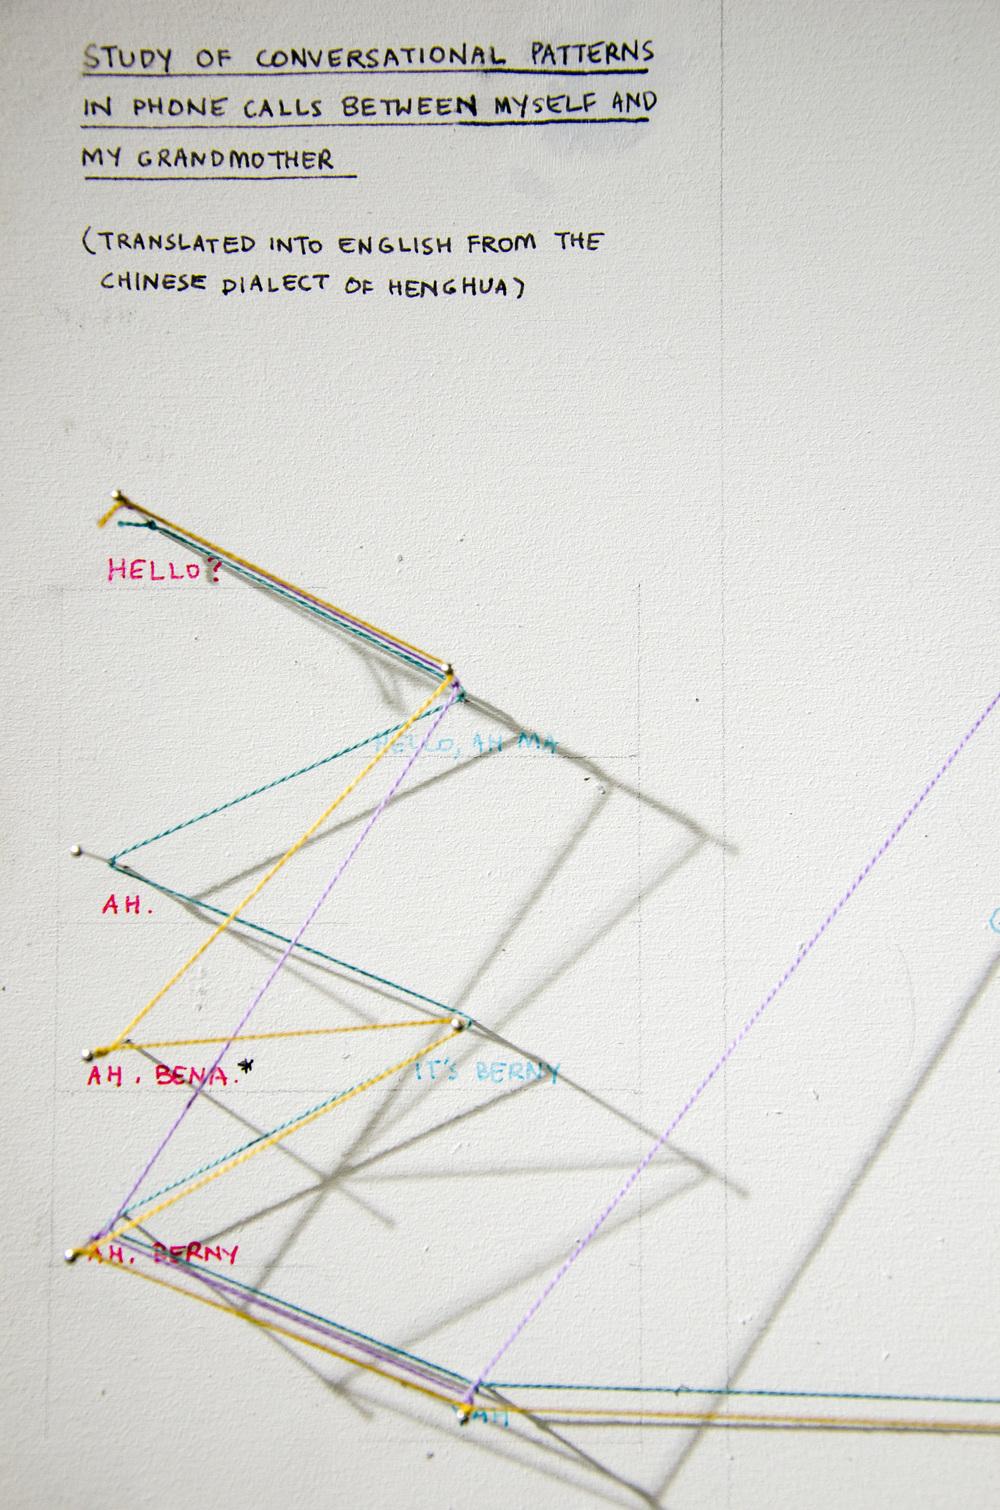 Study of Conversational Patterns_03.jpg